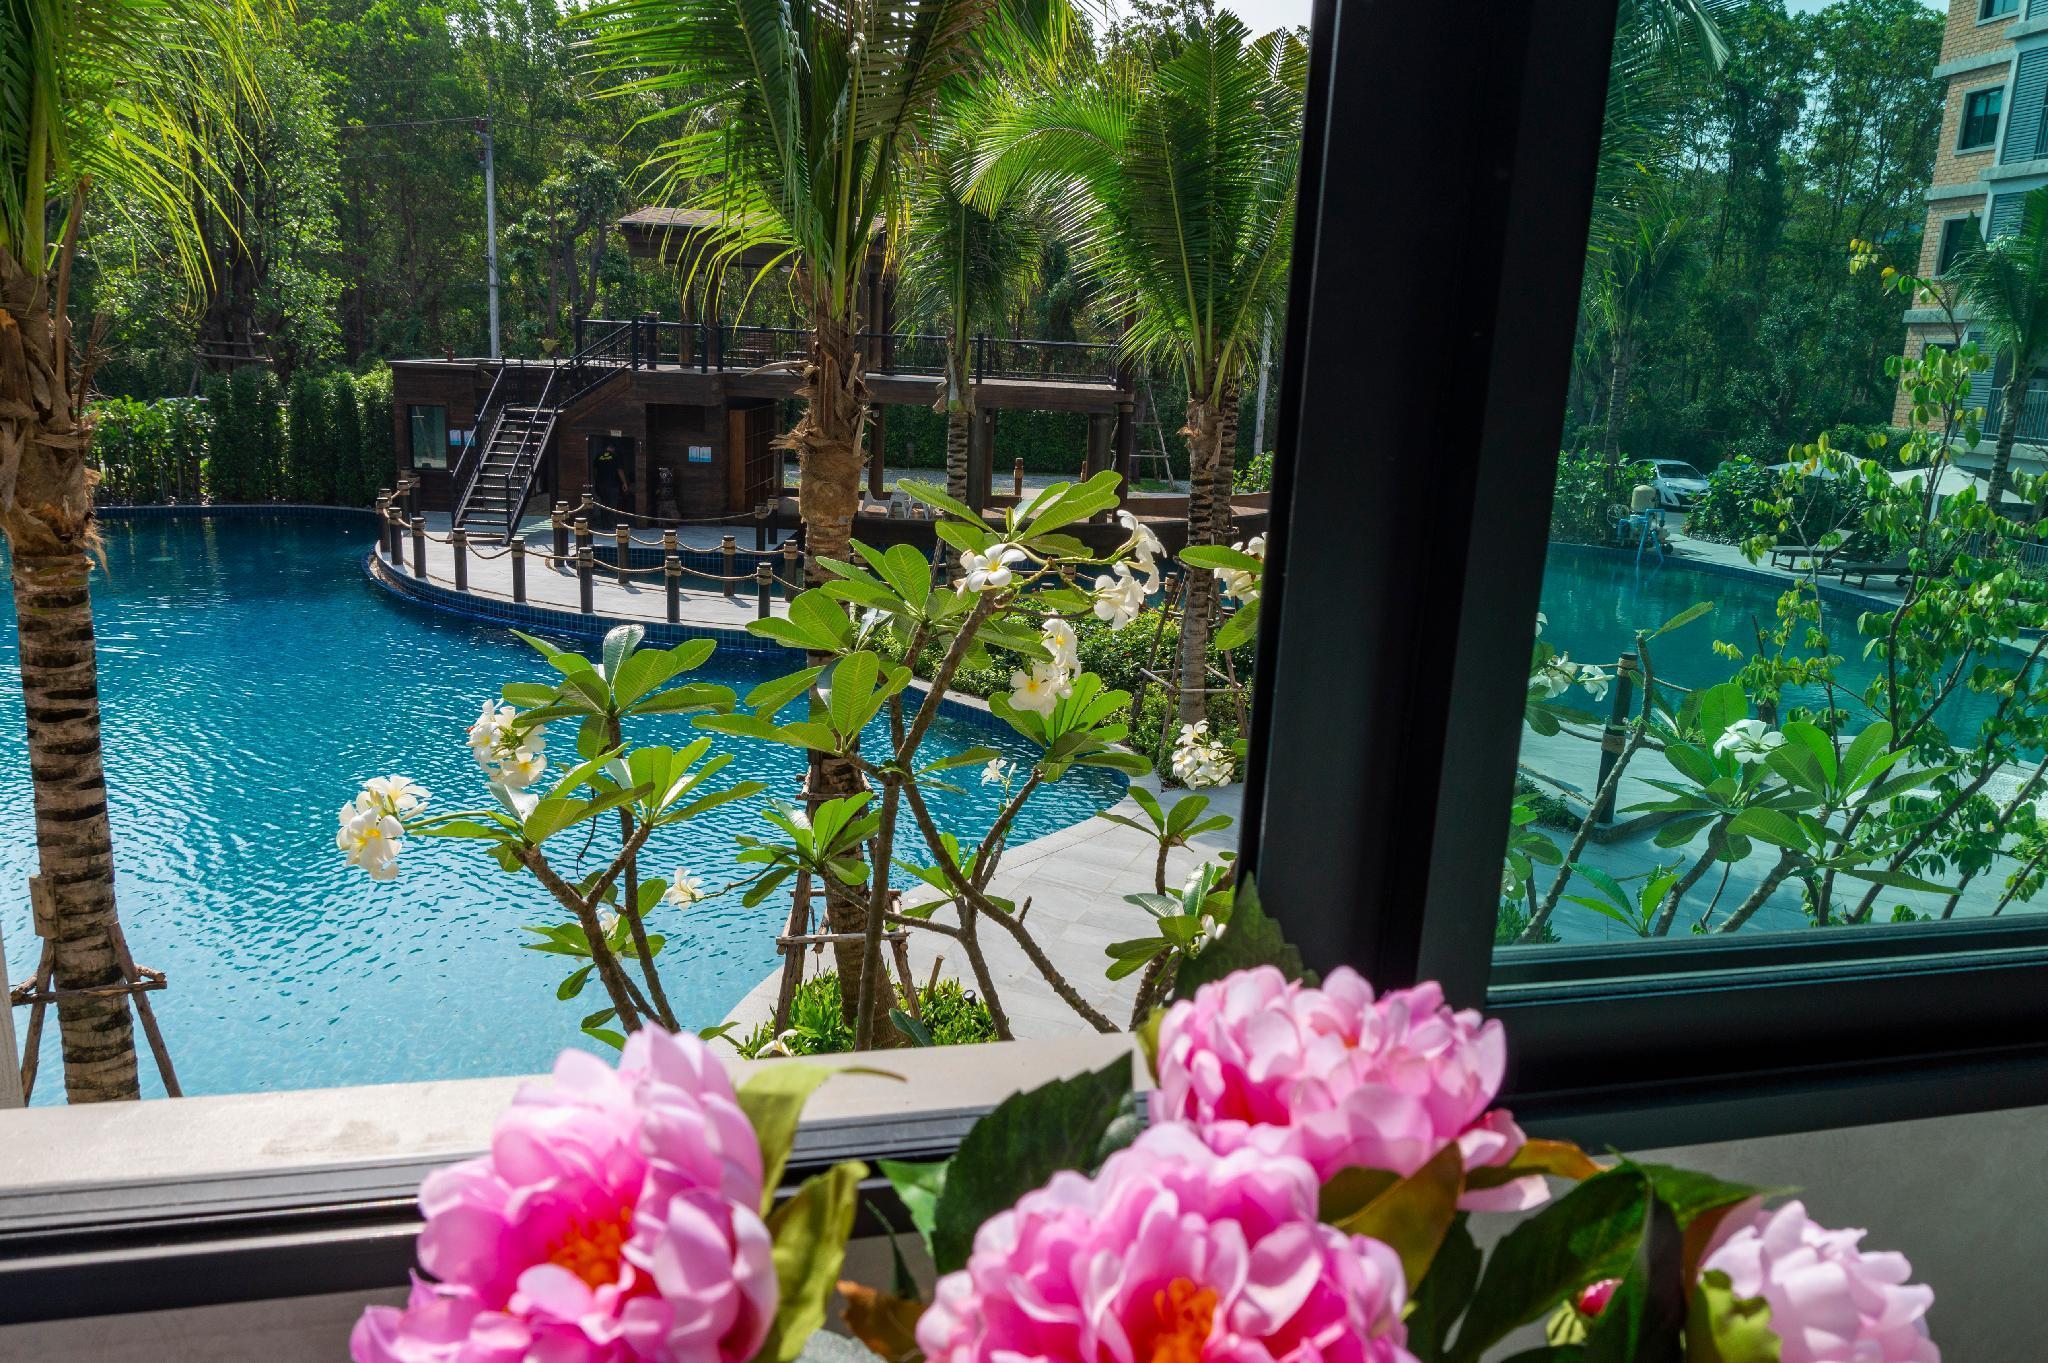 Flowers apartment Title residencies Phuket Naiyang อพาร์ตเมนต์ 1 ห้องนอน 1 ห้องน้ำส่วนตัว ขนาด 39 ตร.ม. – บางเทา